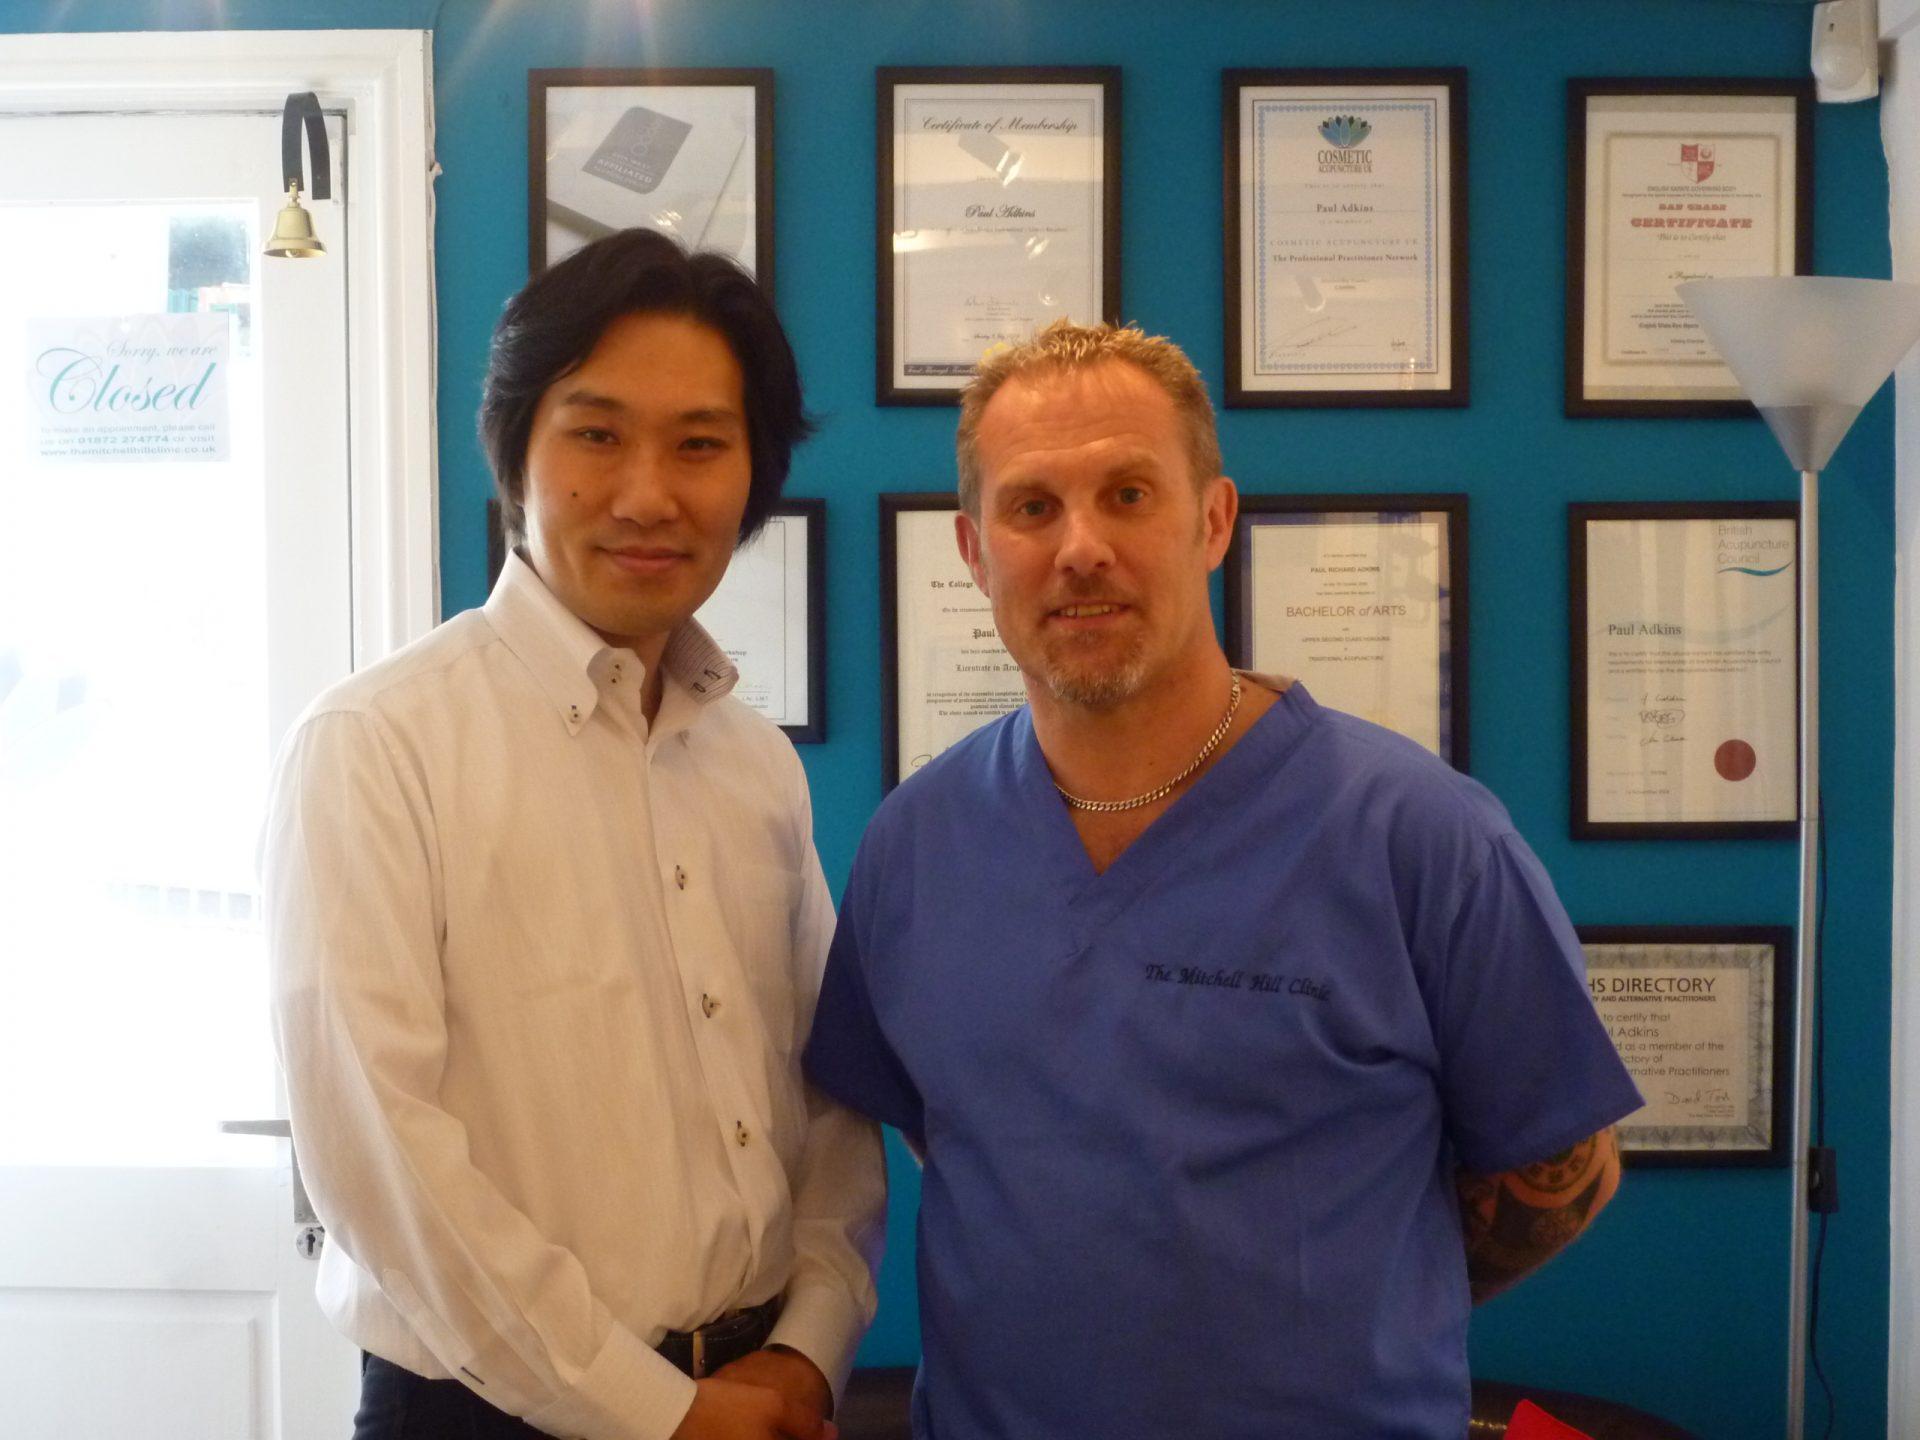 Paul Adkins and Takao Ueda 2010